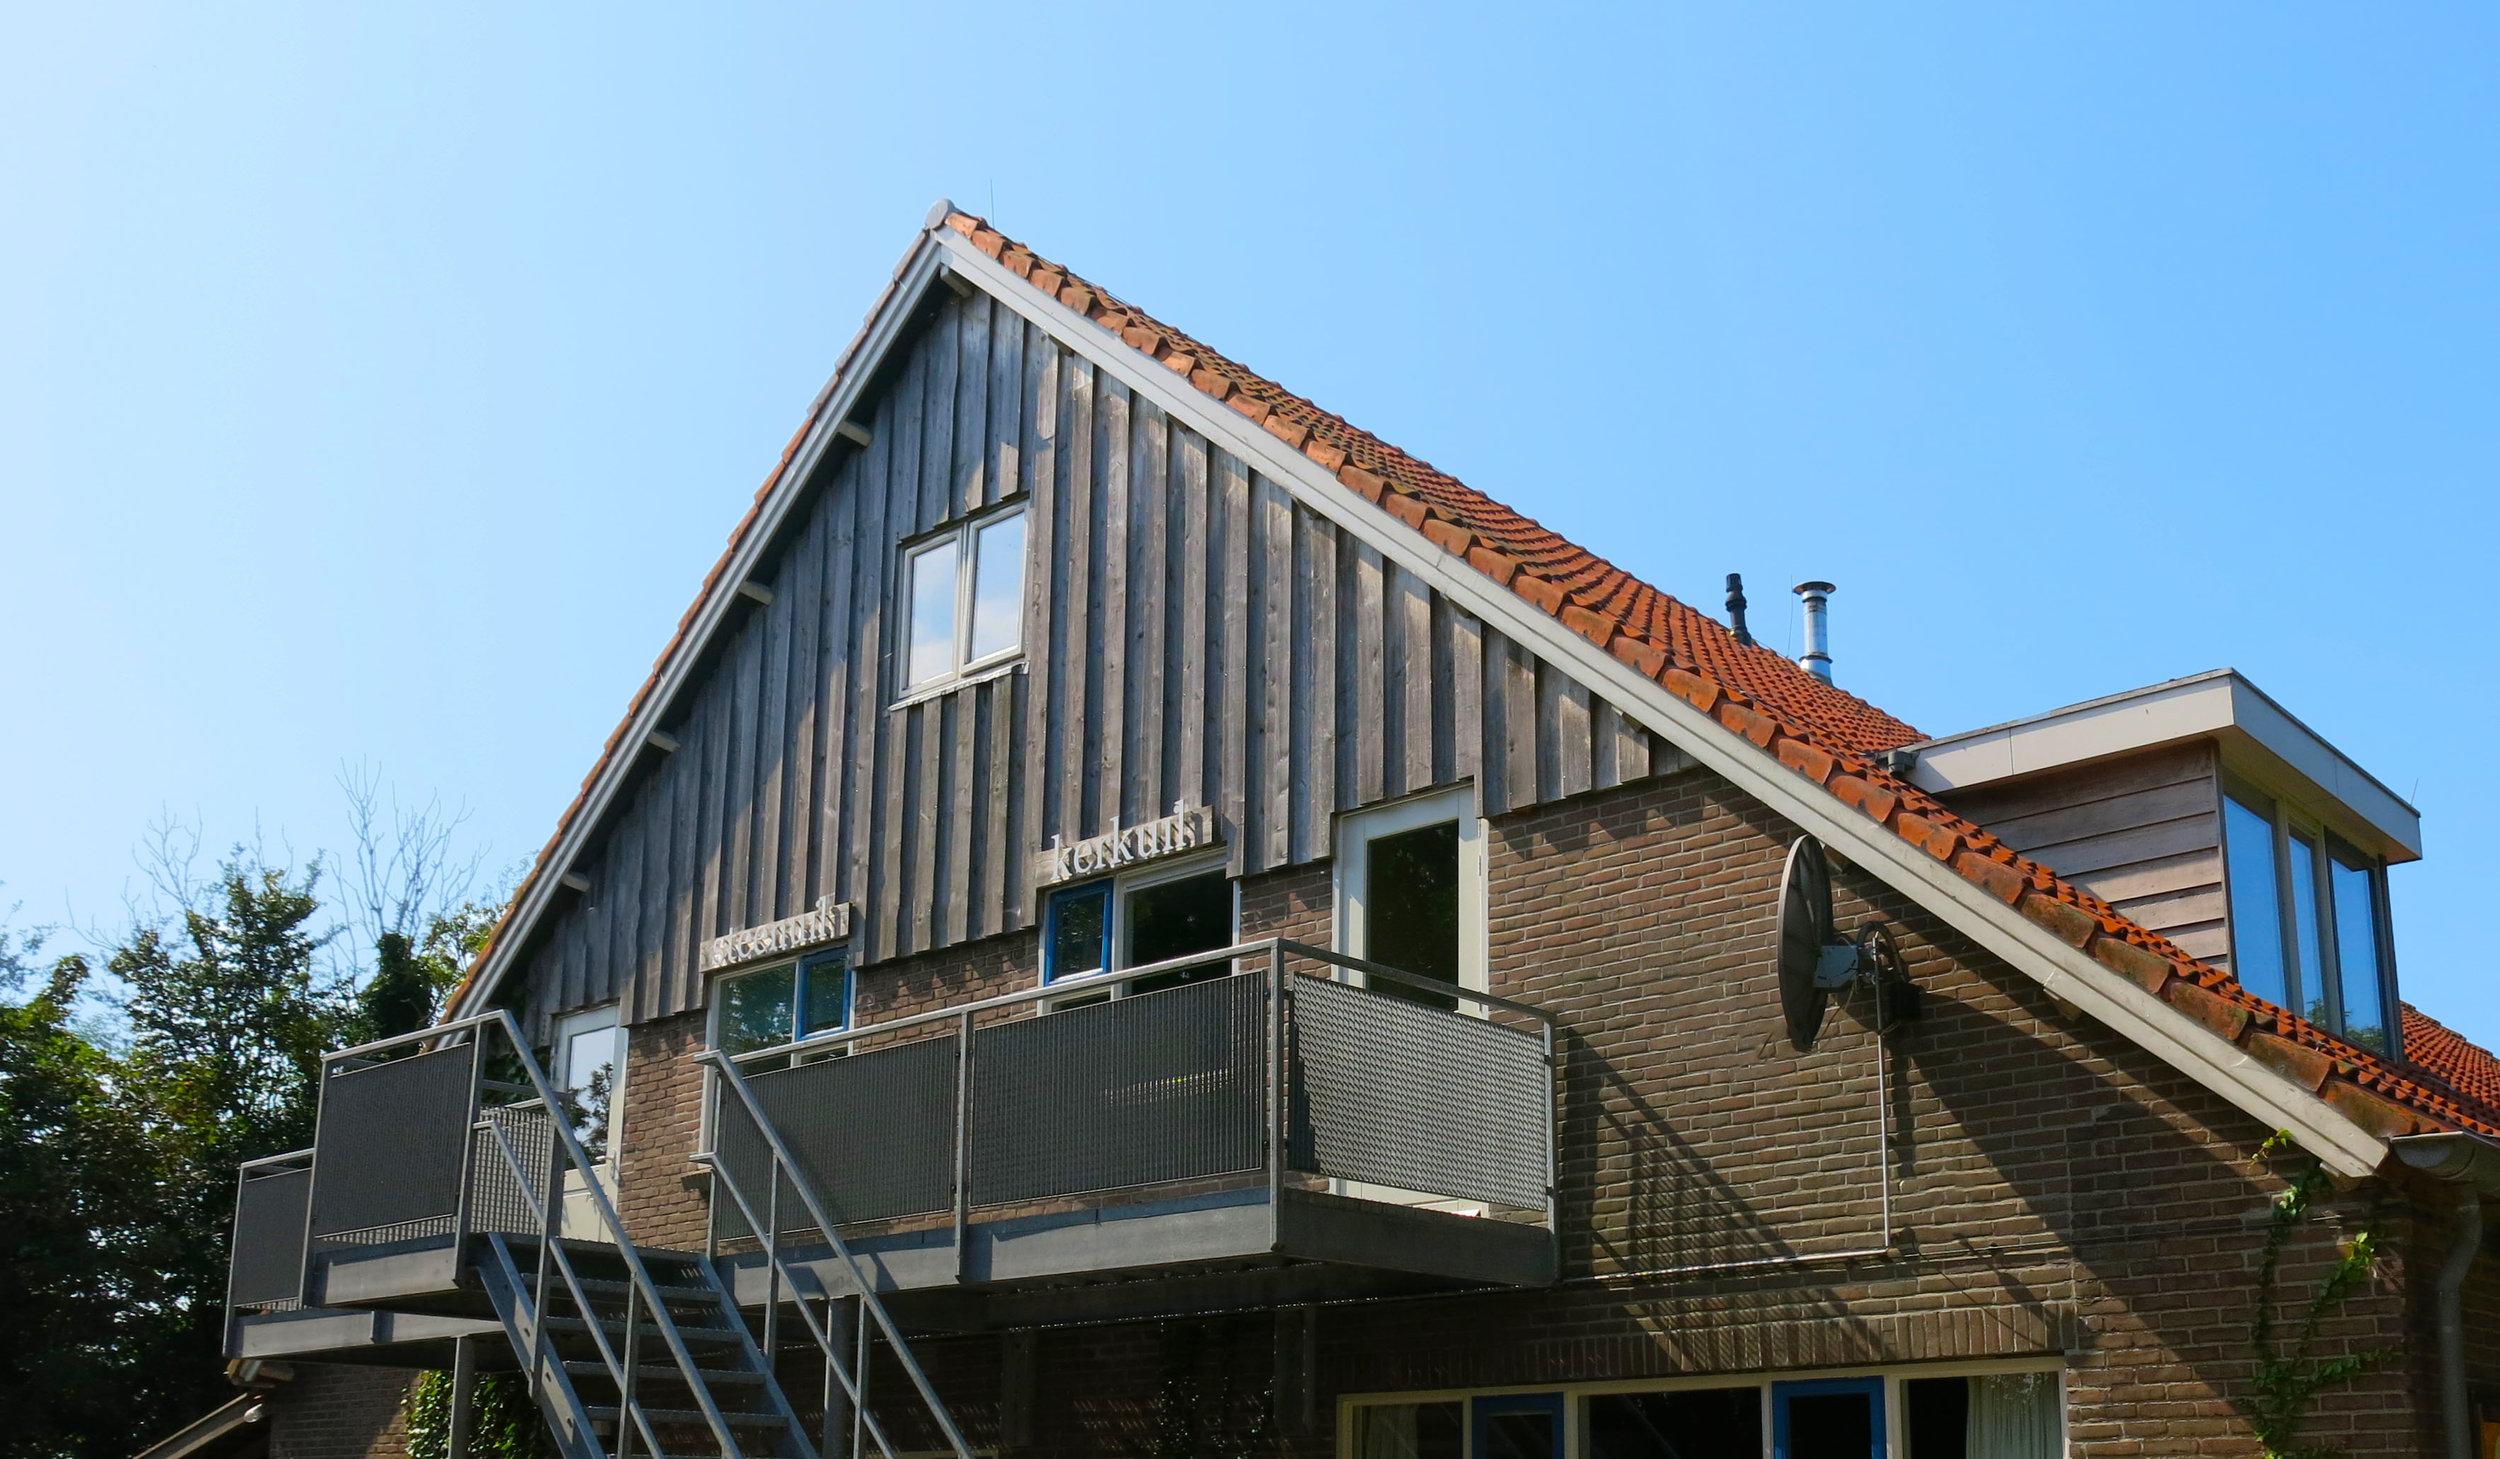 Opgang en dakkapel kerkuil